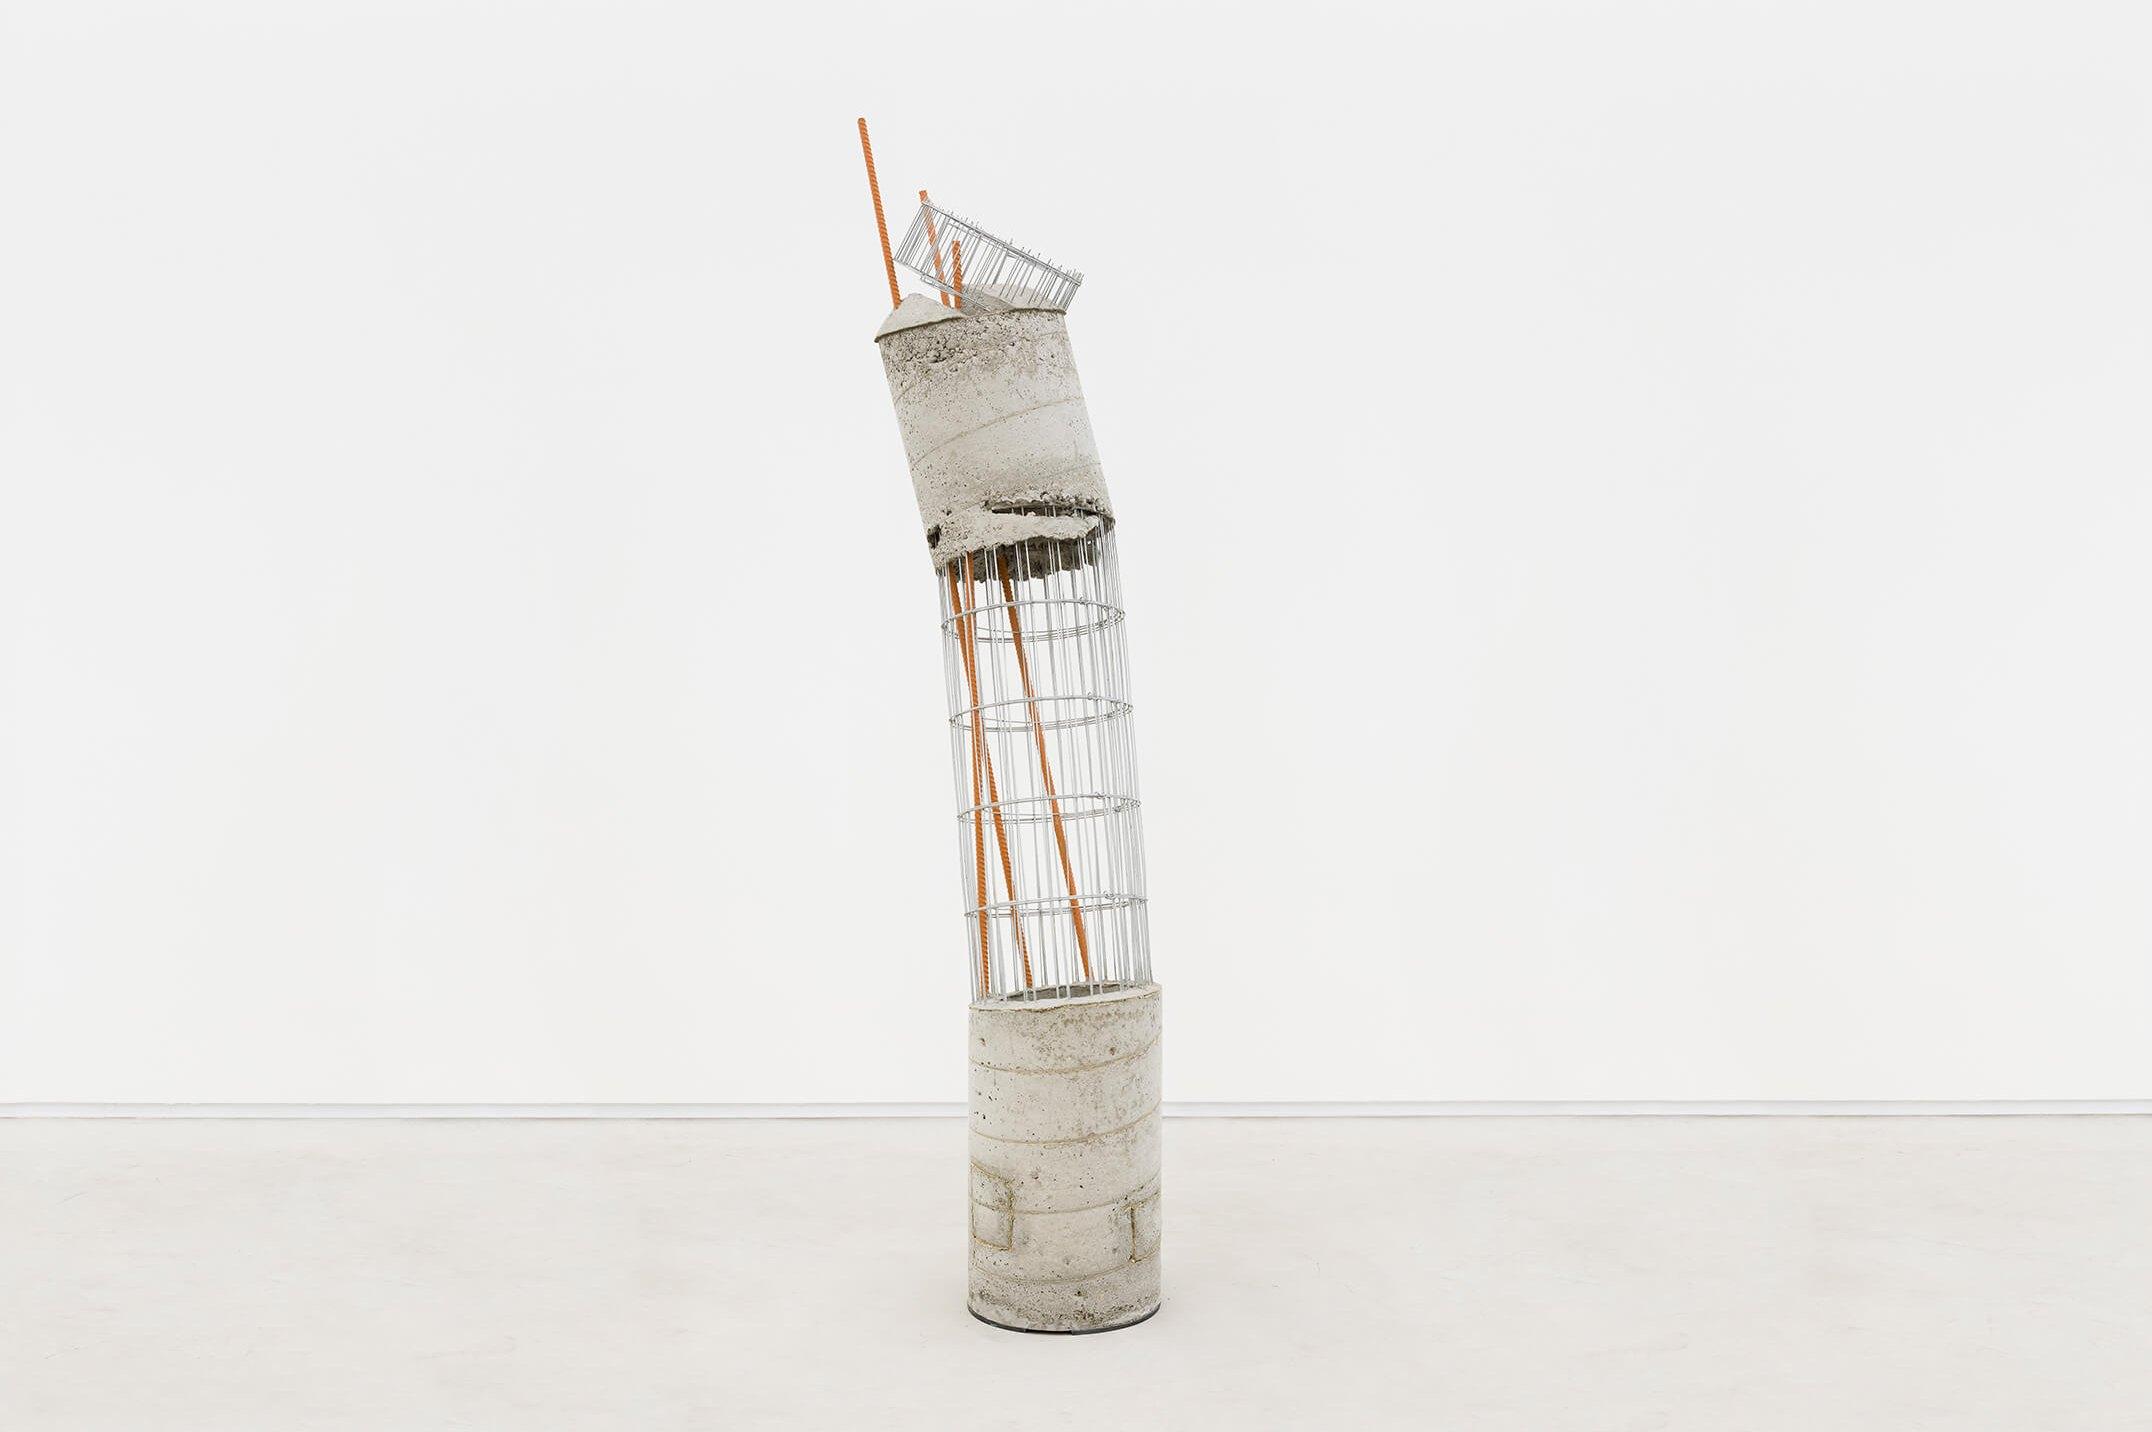 Allyson Vieira,<em>Worker 4</em>, 2015,concrete, steel and caution tape,189 × 38 ×36 cm - Mendes Wood DM